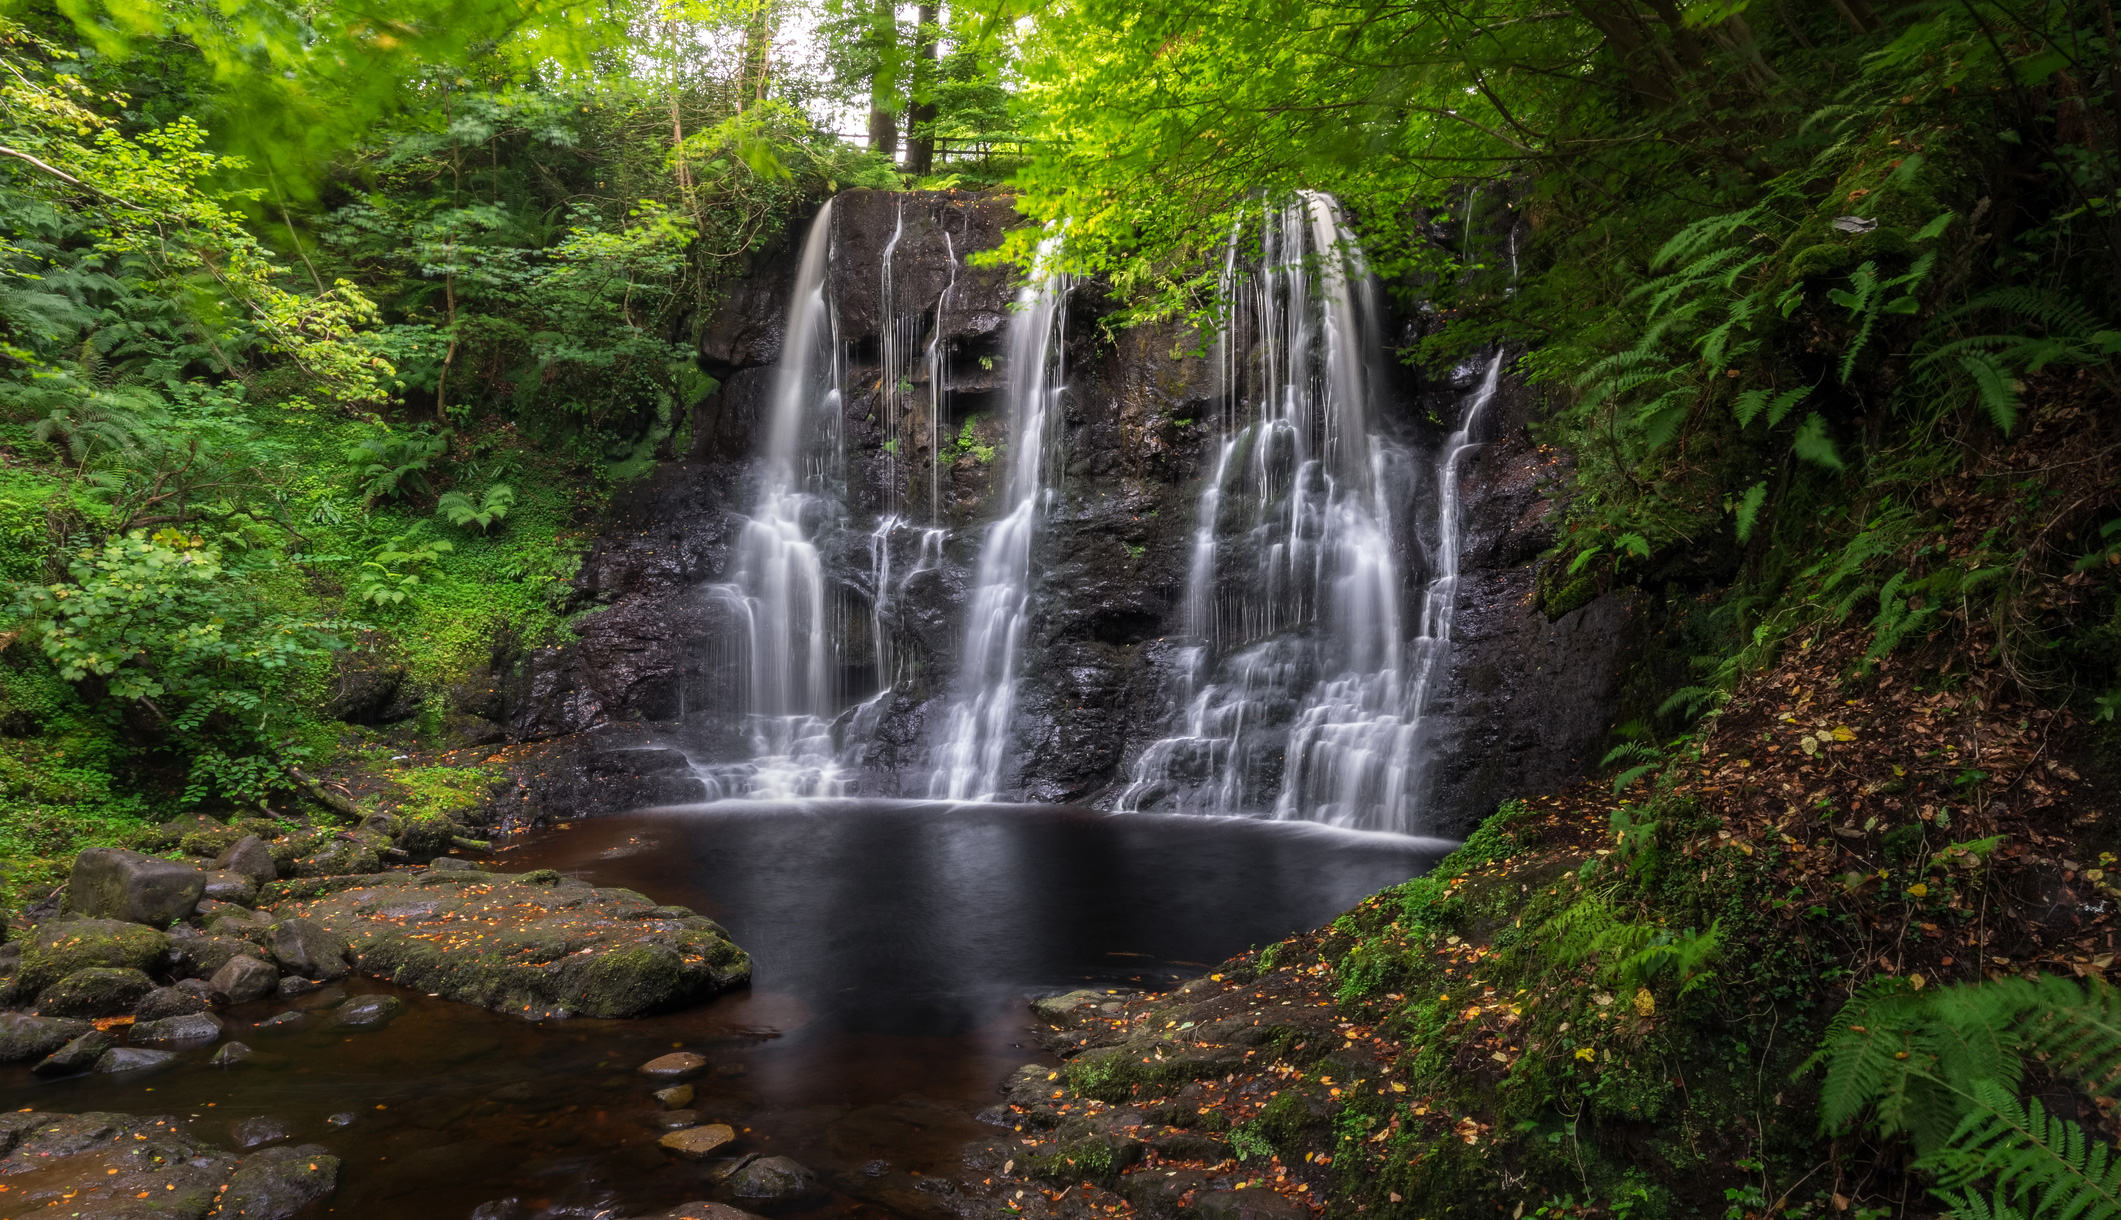 Ess na Crub Waterfall, Glengarriff